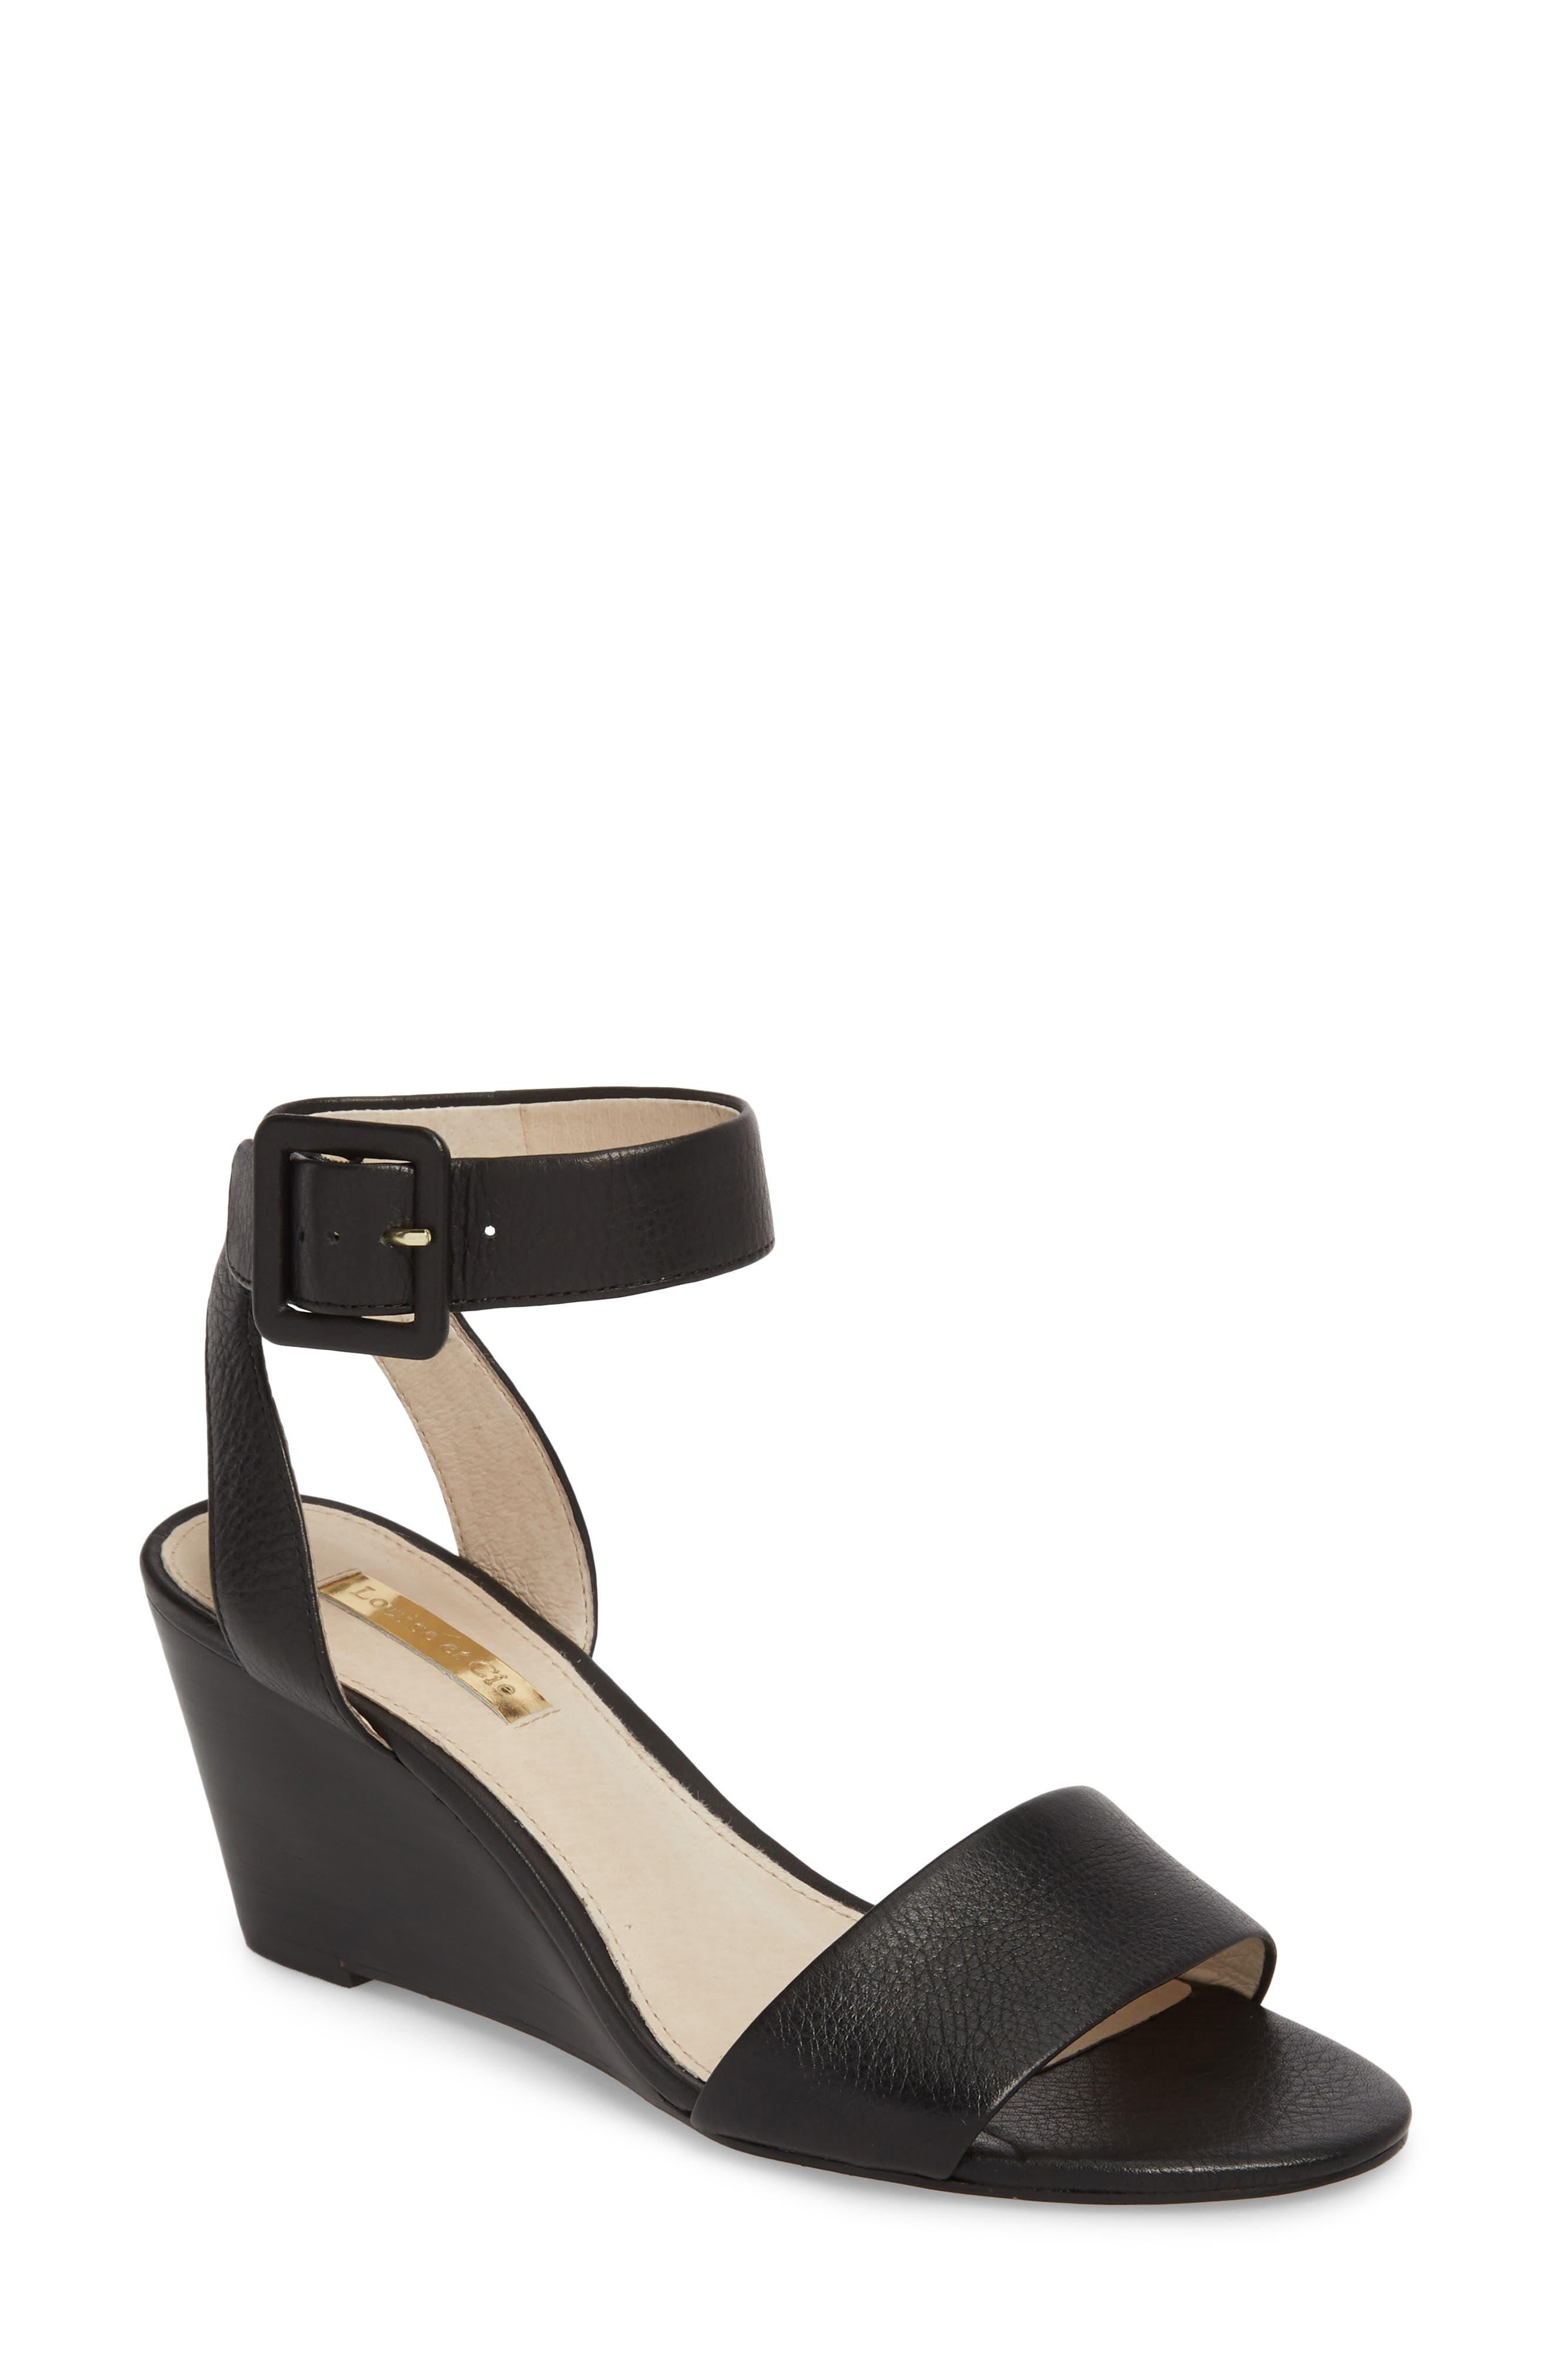 Punya Wedge Sandal,                         Main,                         color, BLACK LEATHER